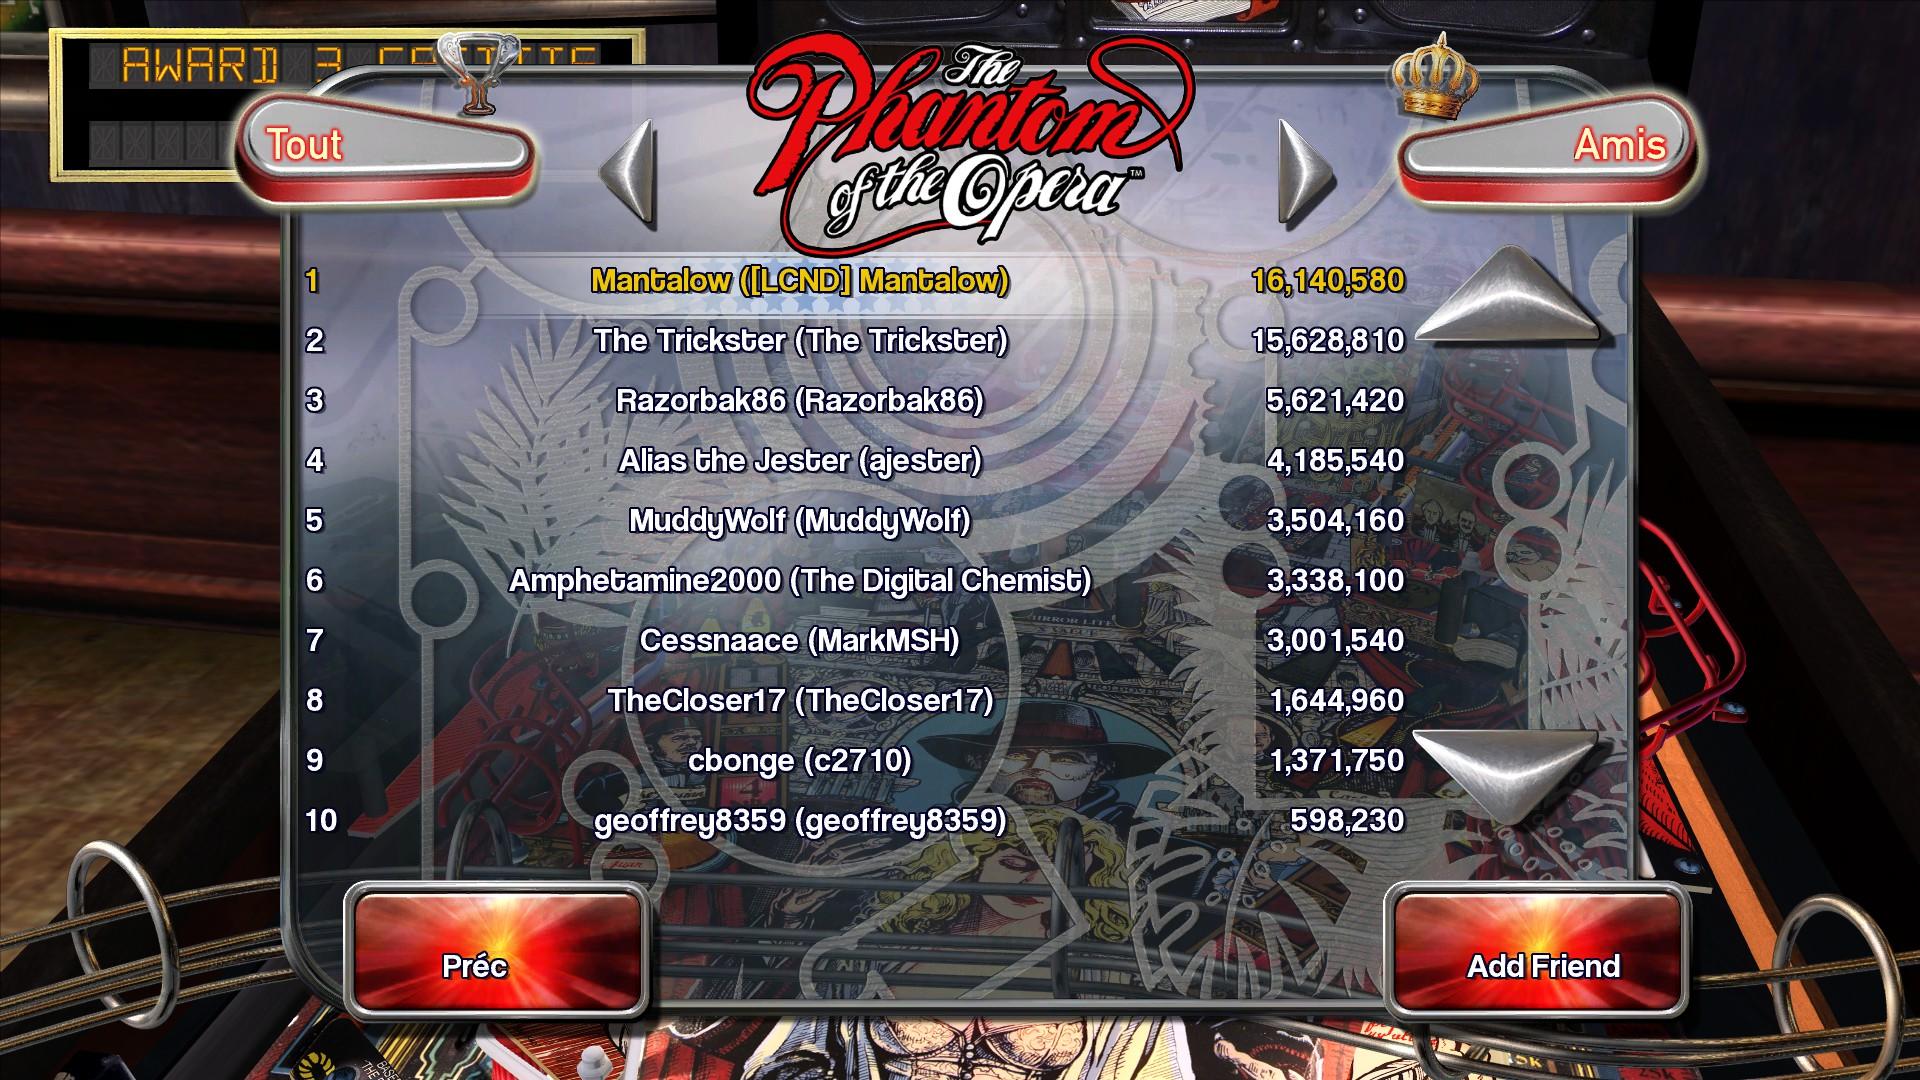 Mantalow: Pinball Arcade: The Phantom Of The Opera (PC) 16,140,580 points on 2015-10-04 12:32:02